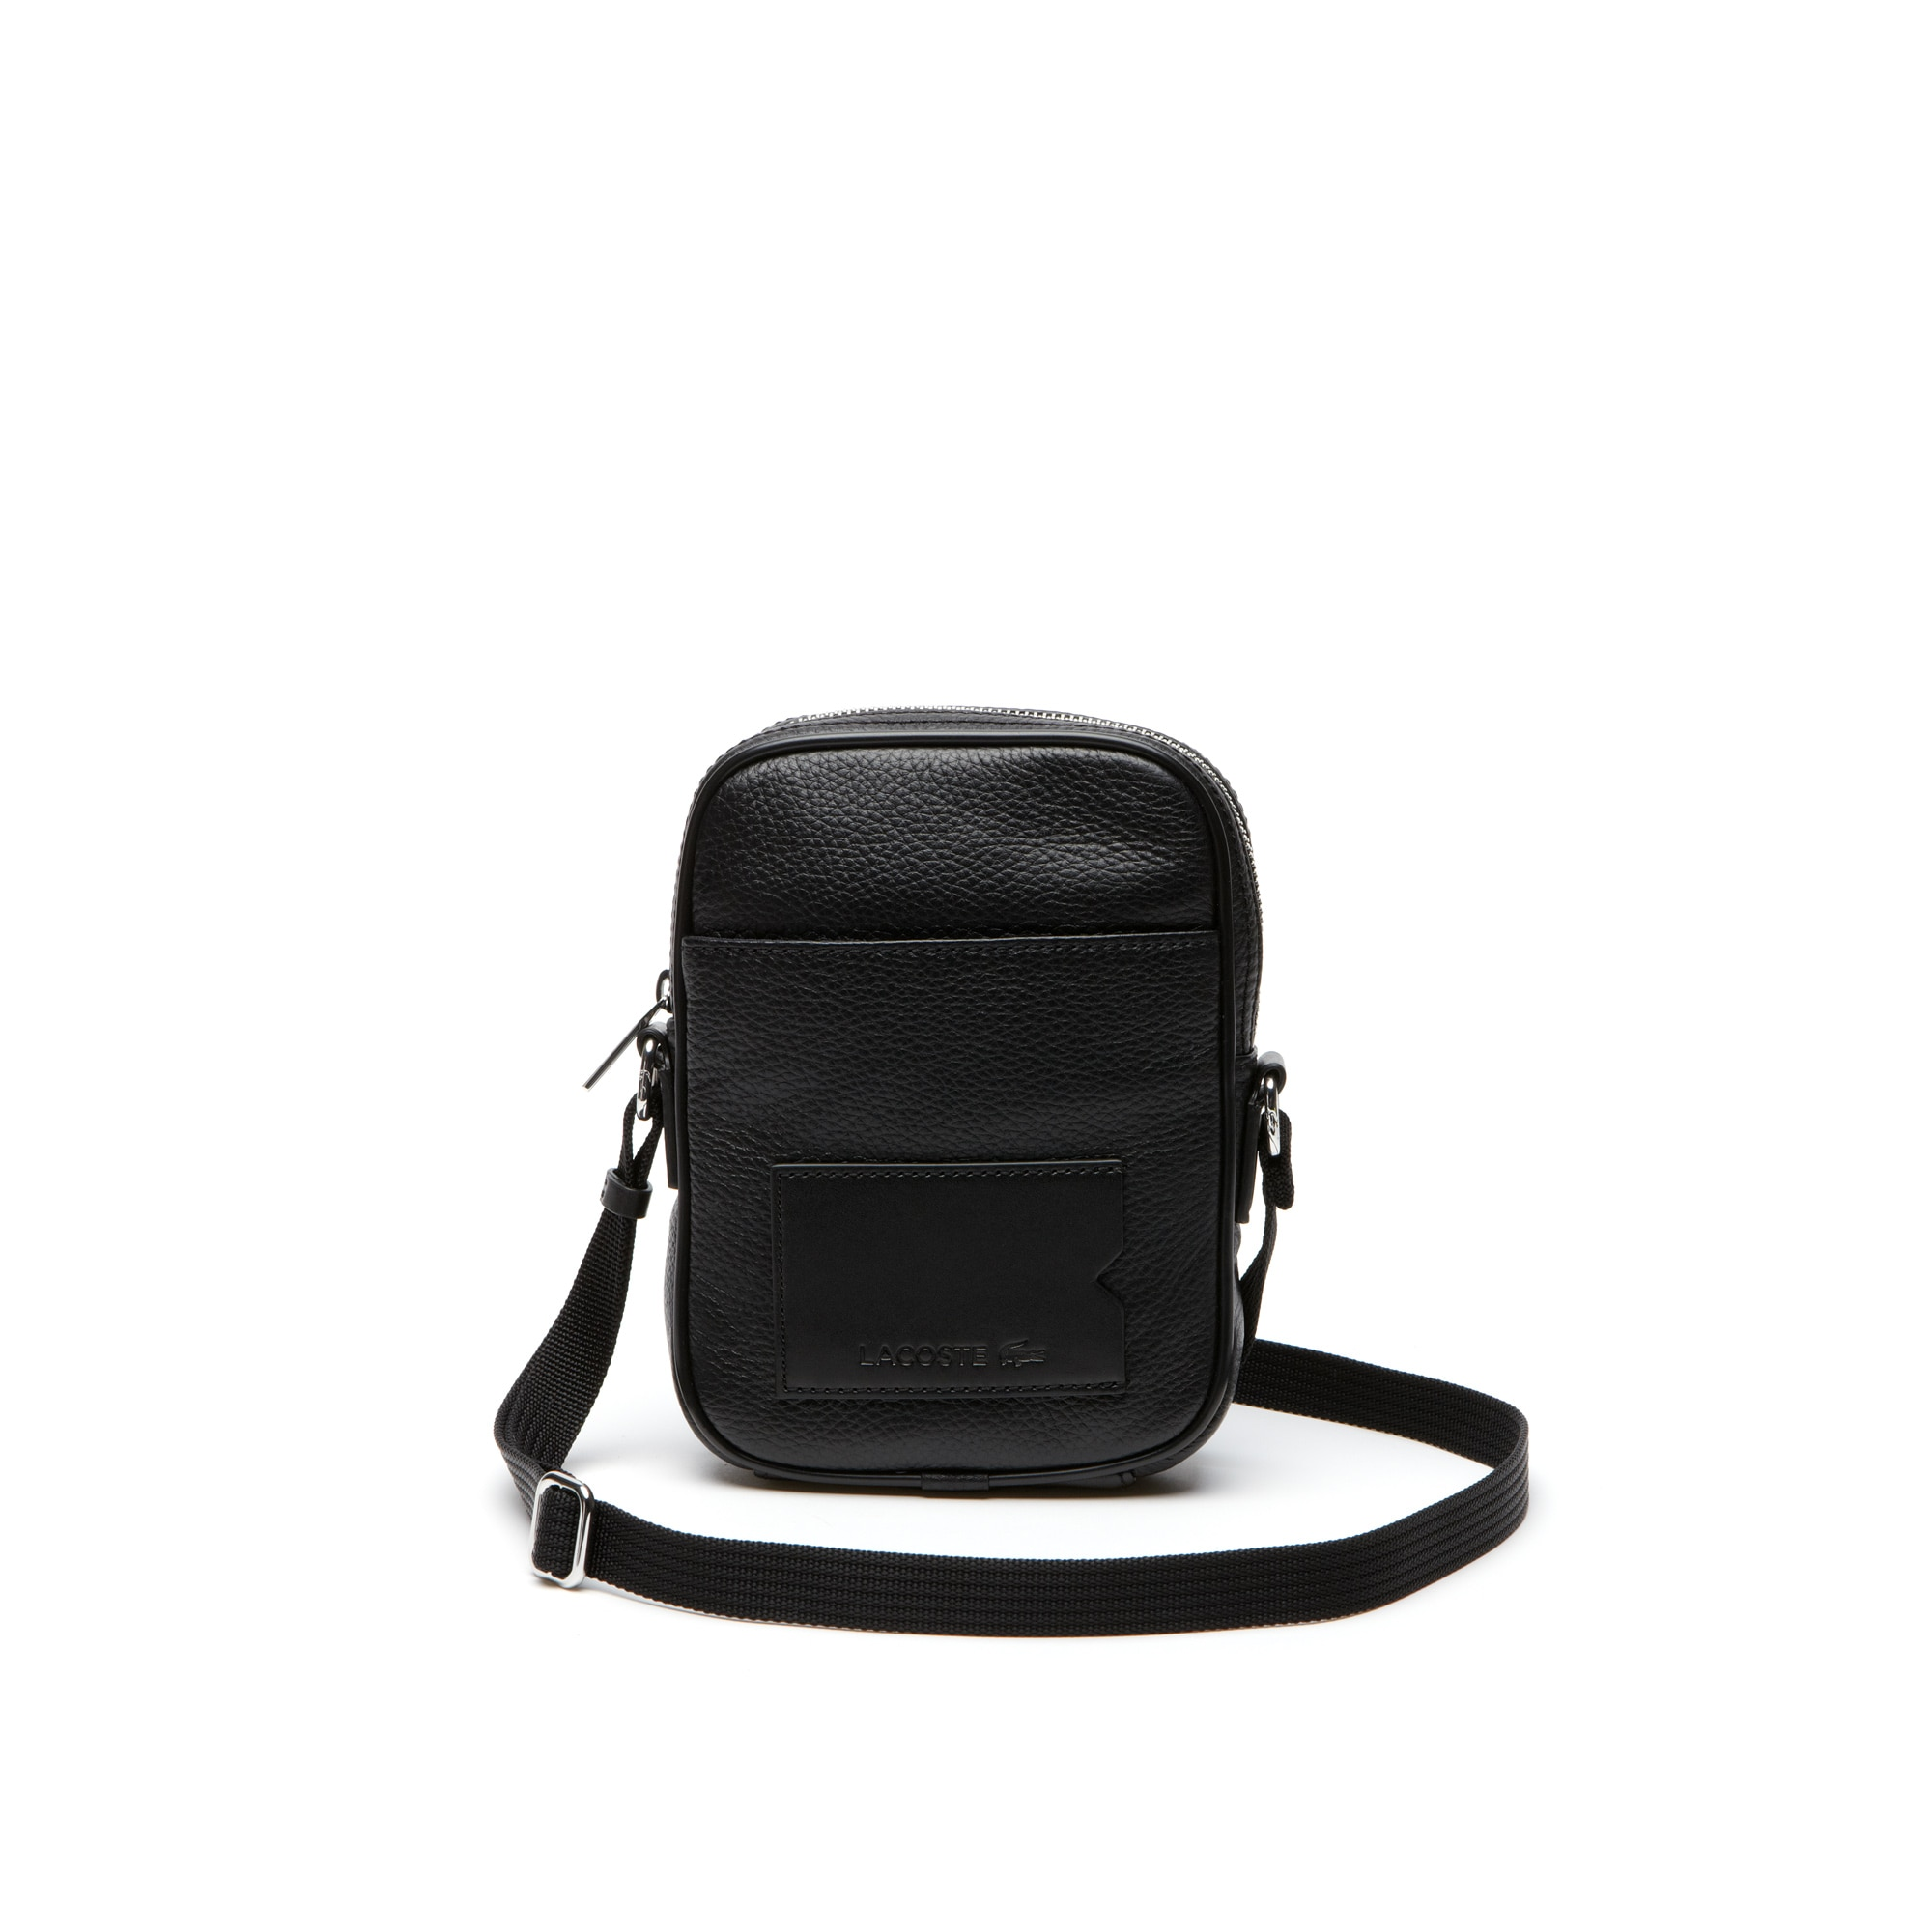 Men's Classic Premium shoulder bag in monochrome leather